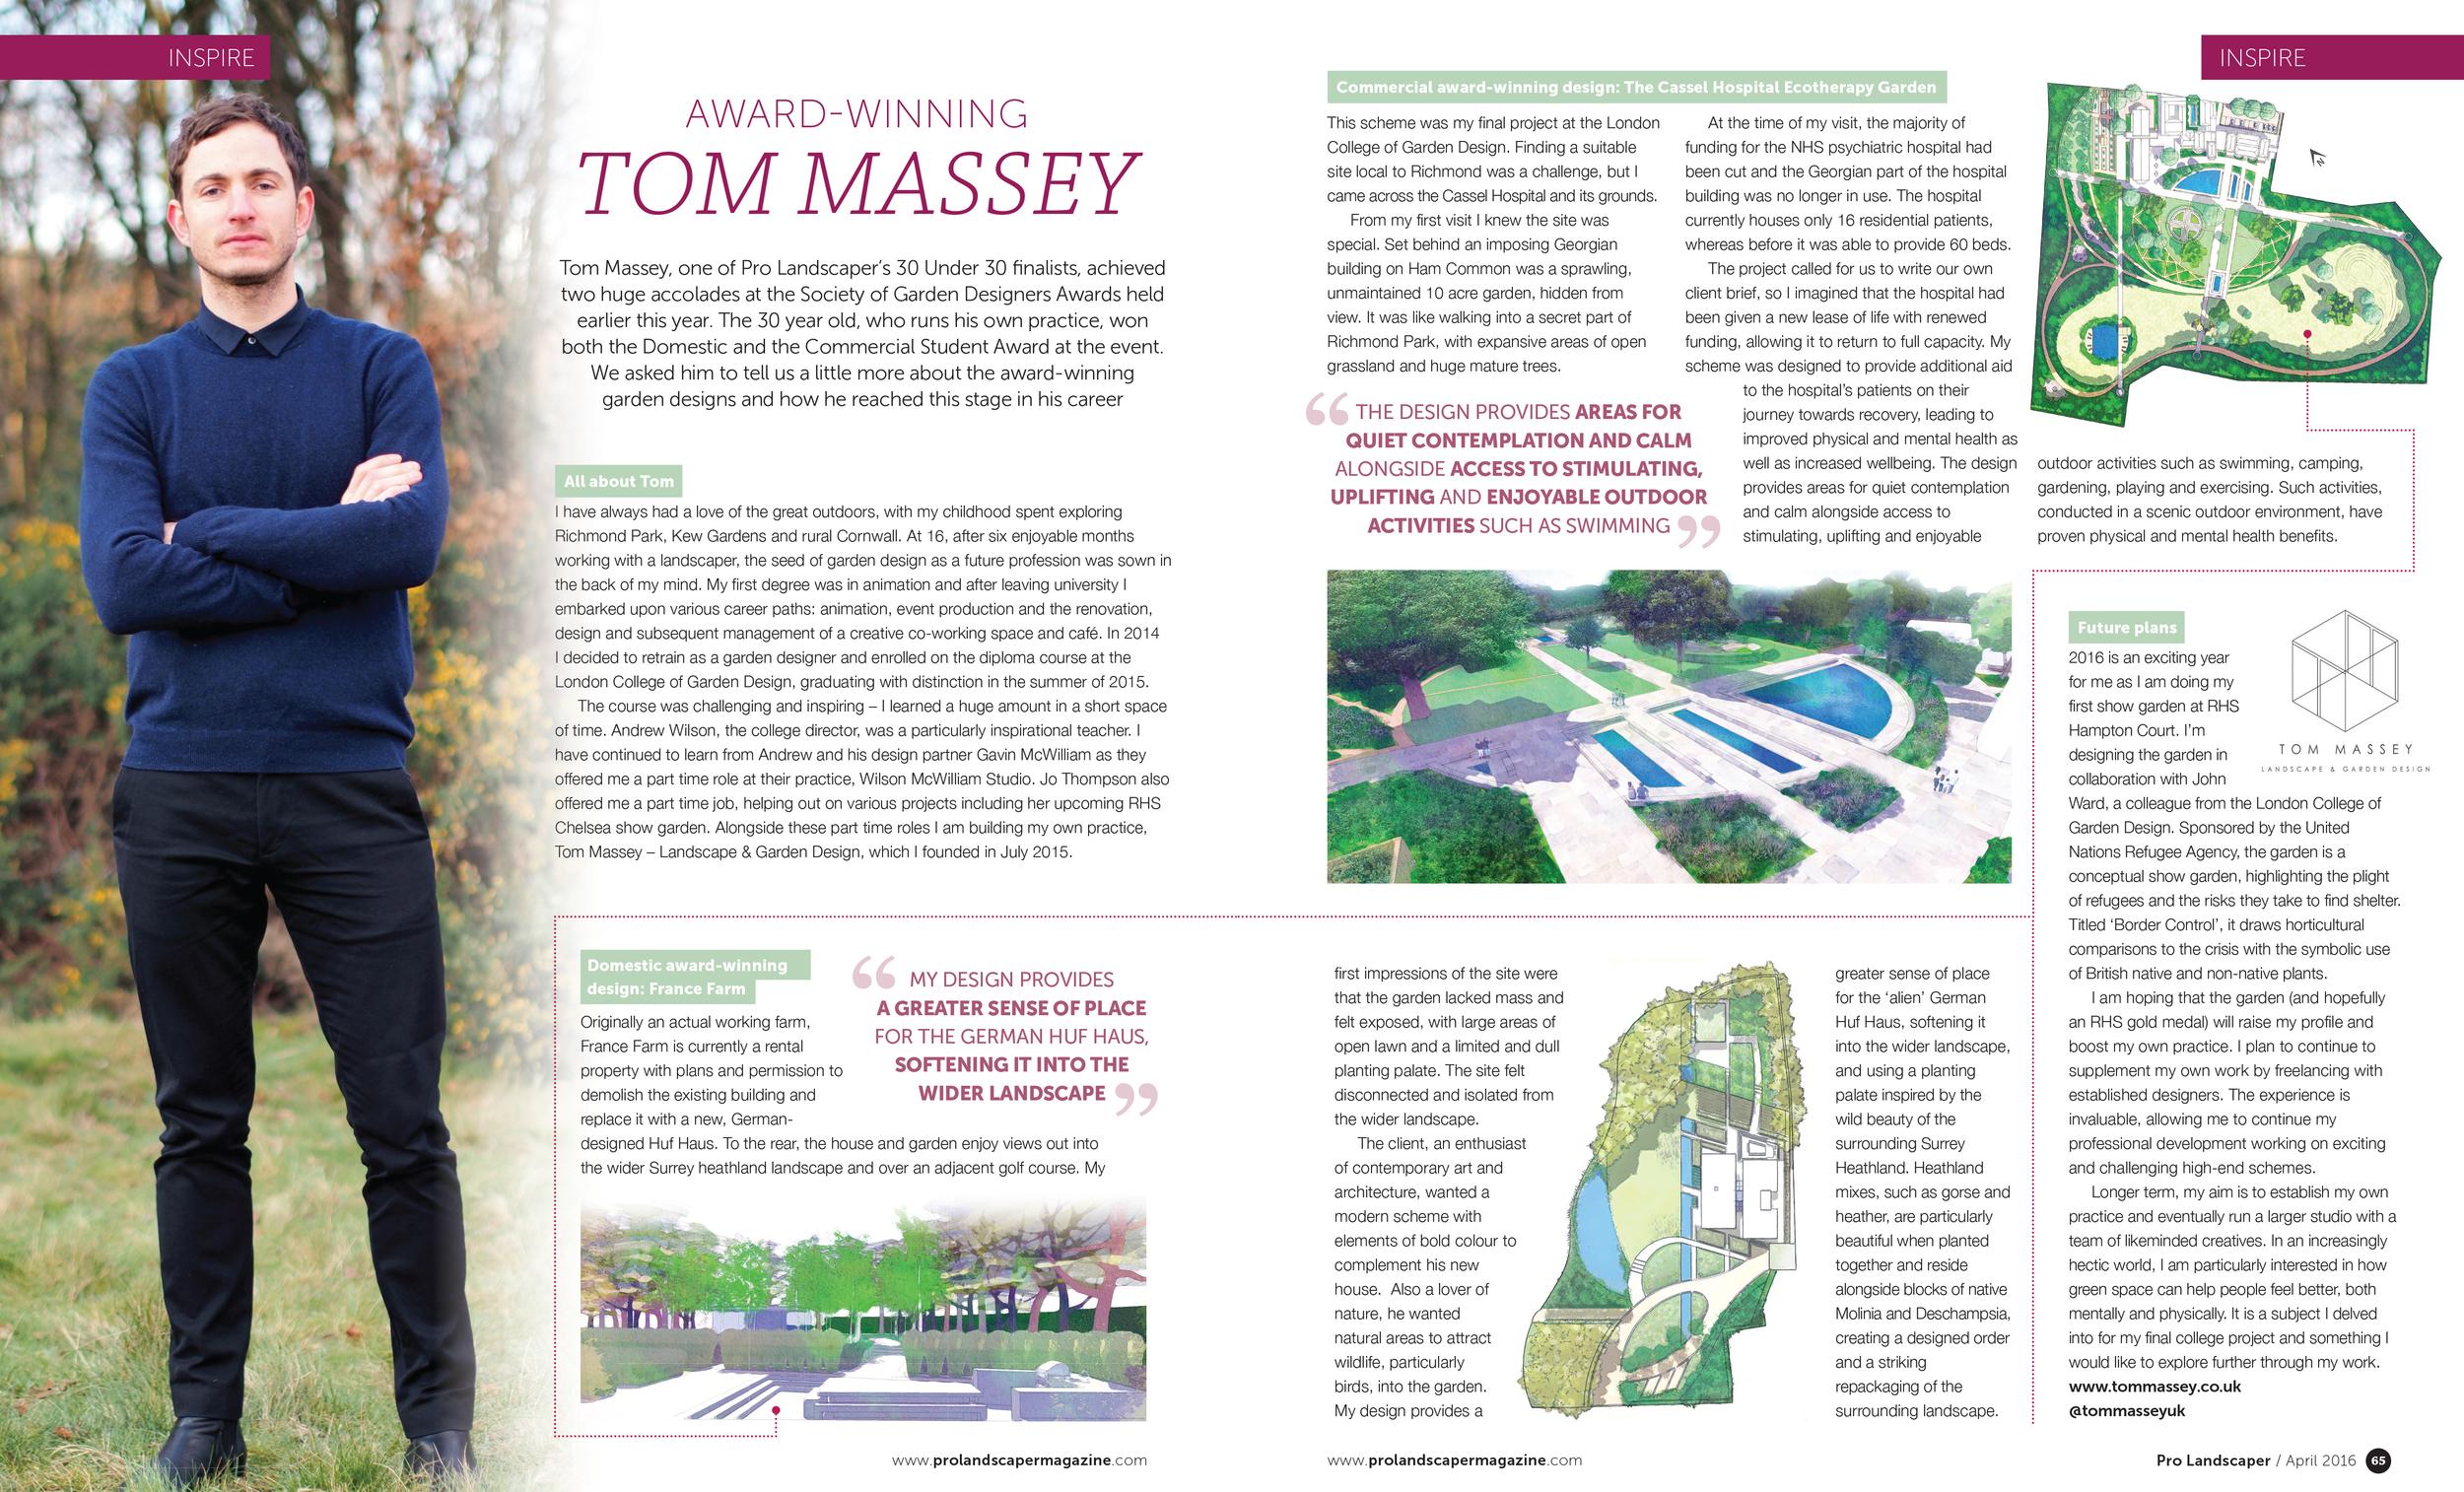 Tom Massey Inspire Article